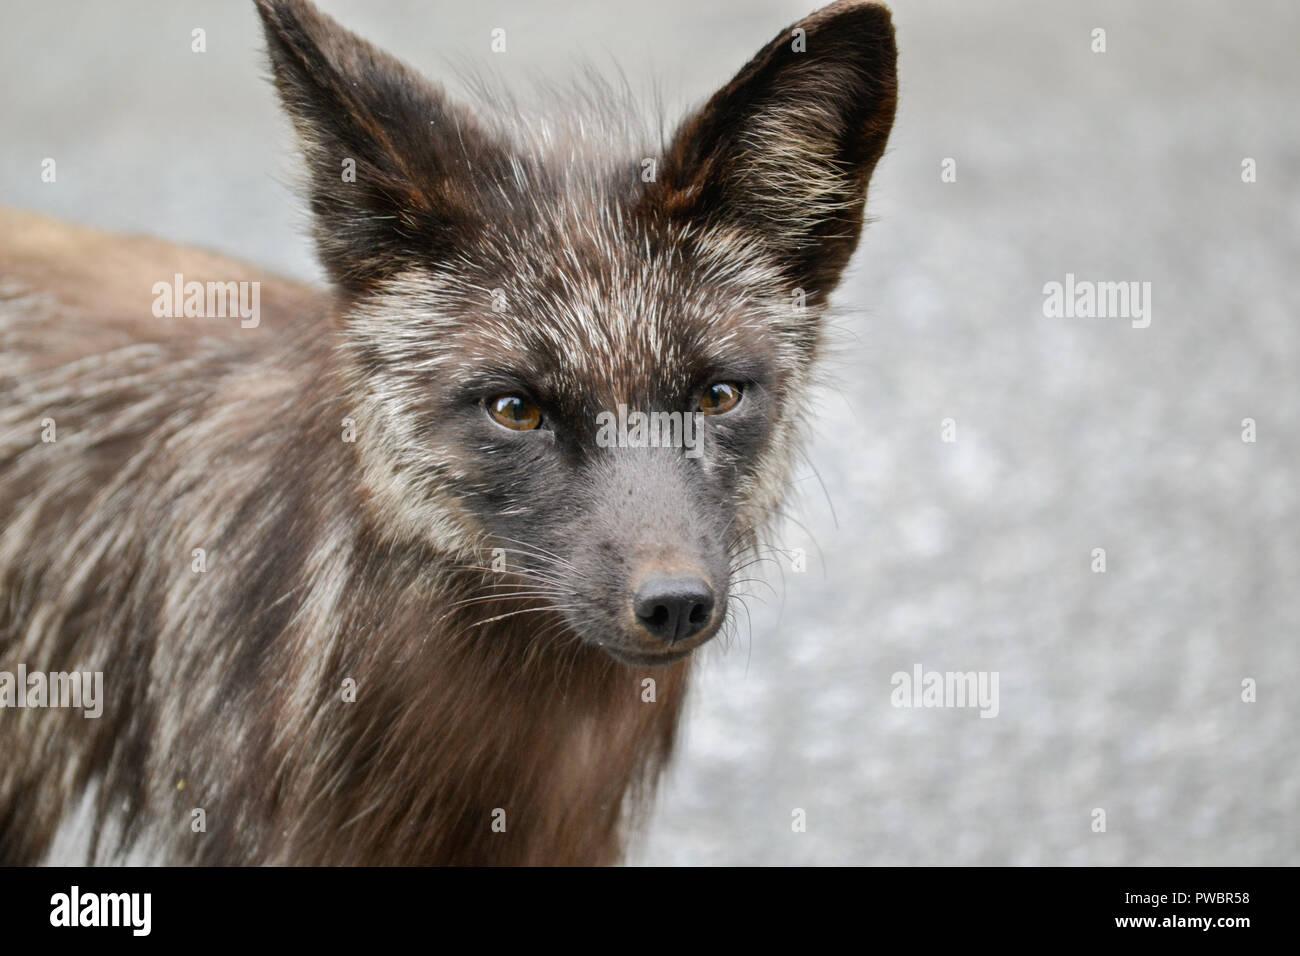 Curious fox - Stock Image